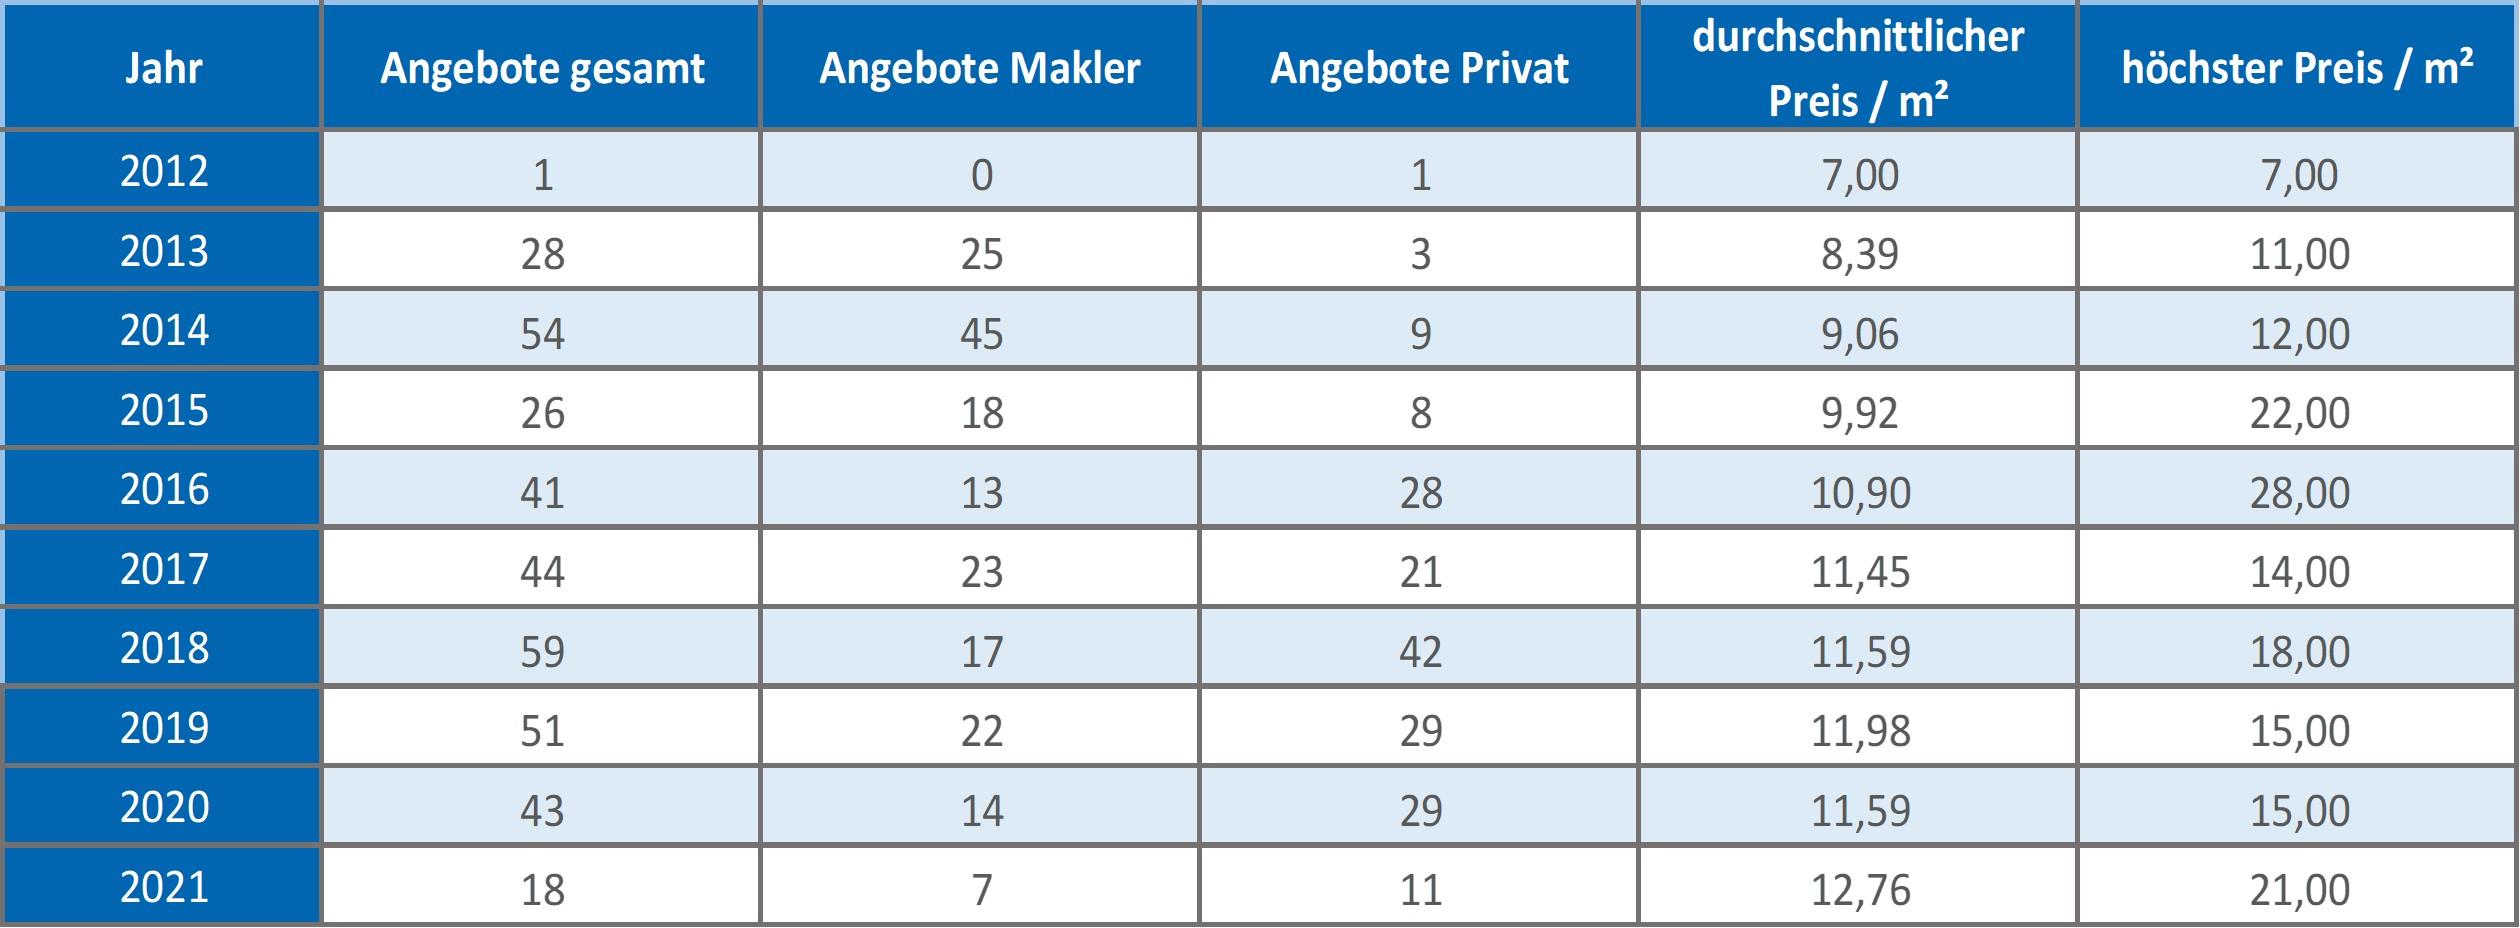 Weßling Haus Wohnung mieten vermieten Preis Bewertung Makler www.happy-immo.de 2019 2020 2021